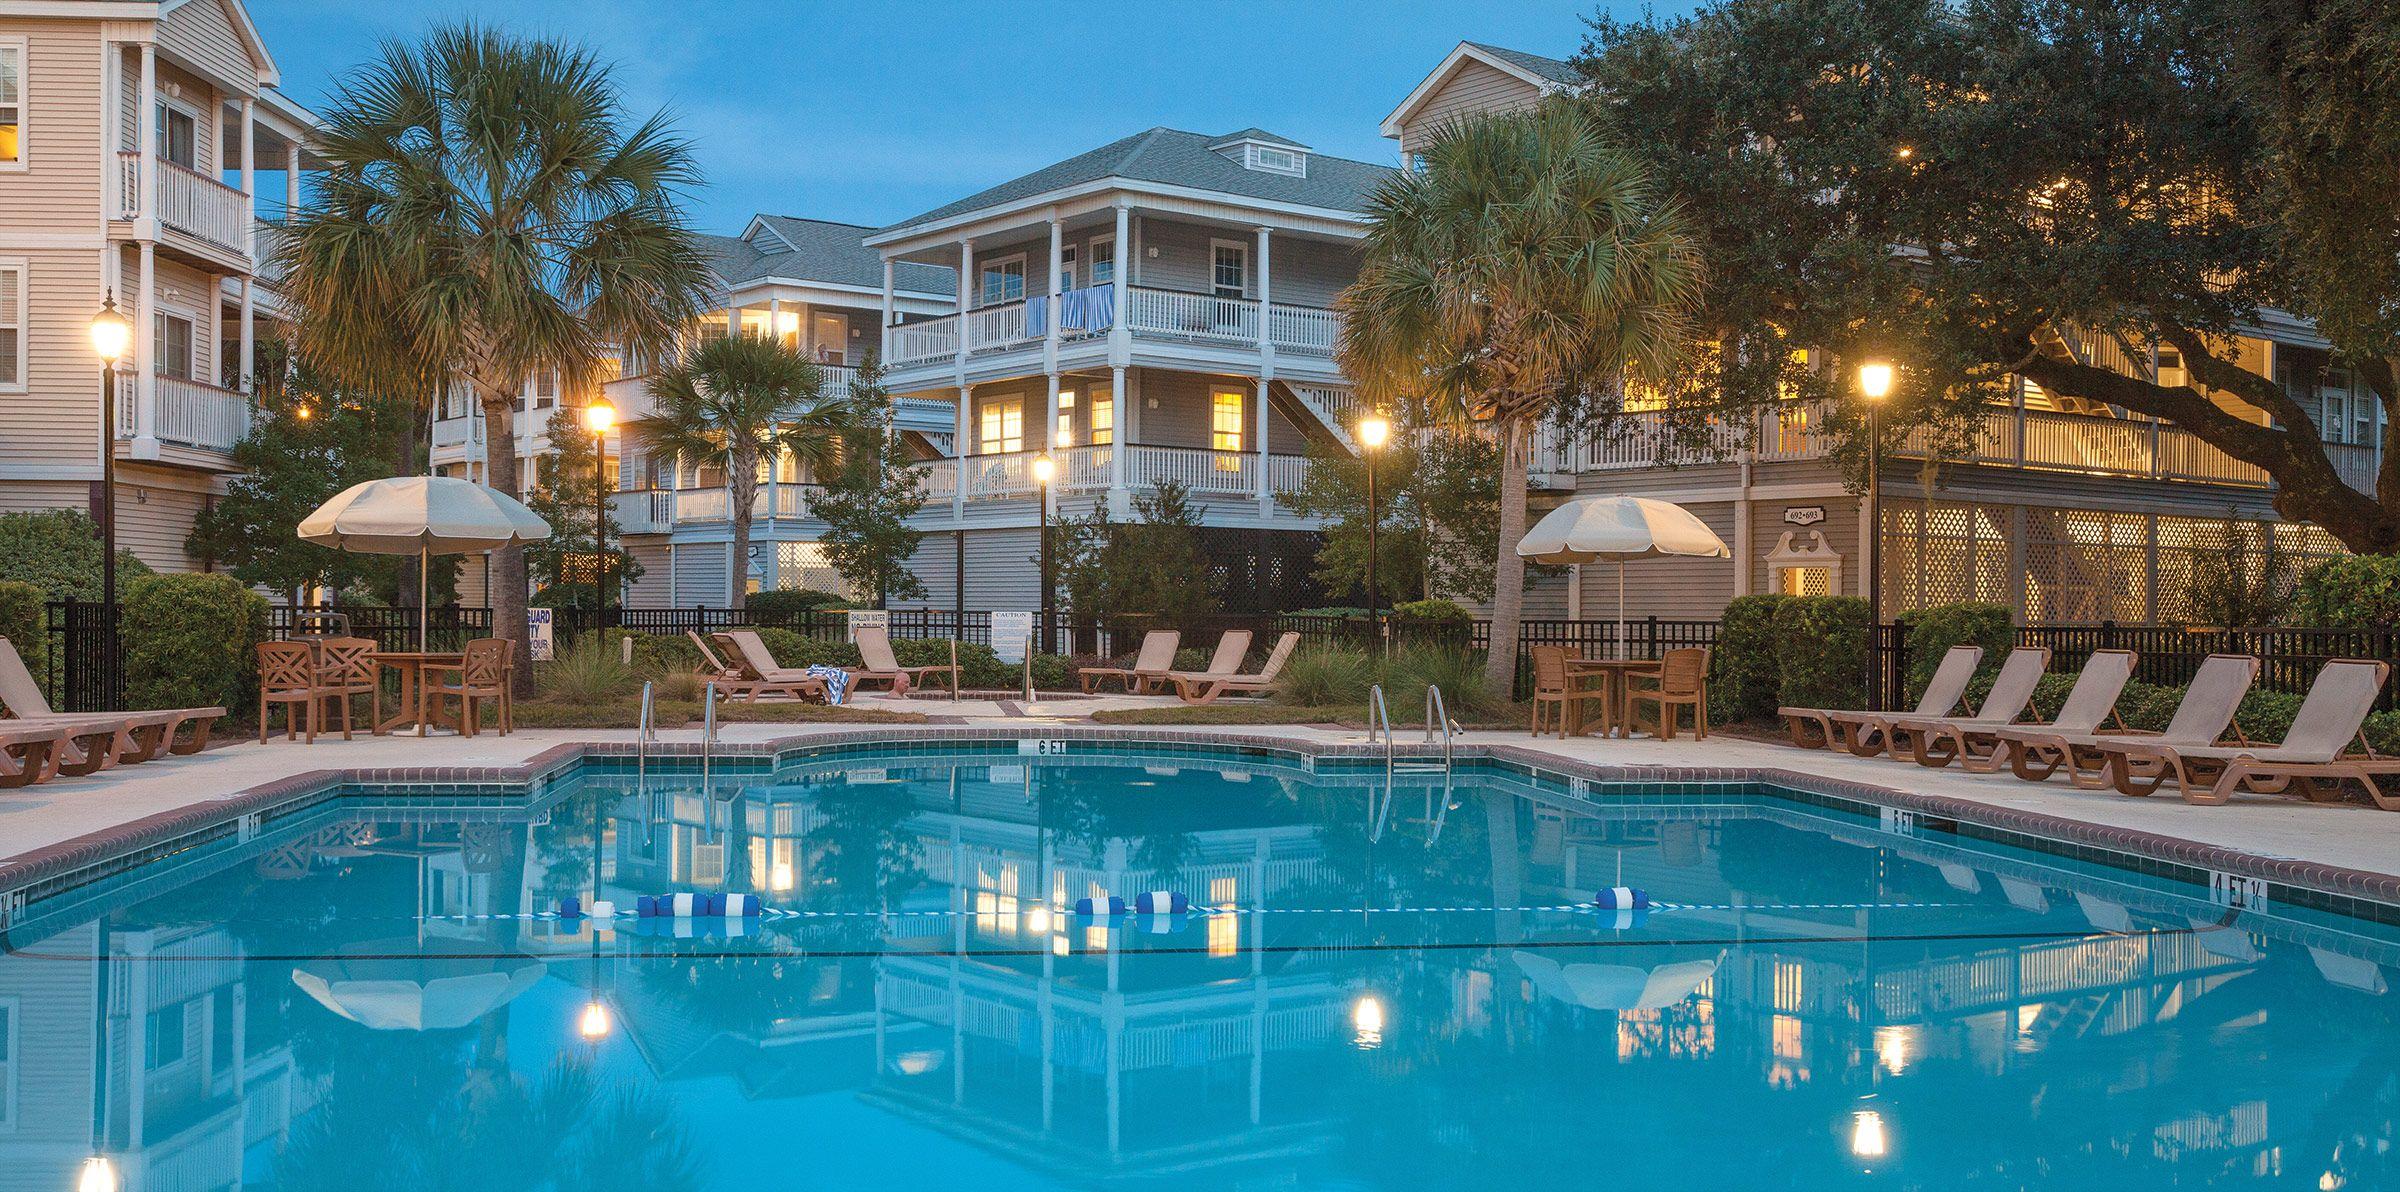 Wyndham Ocean Ridge Edisto, SC Affordable rentals